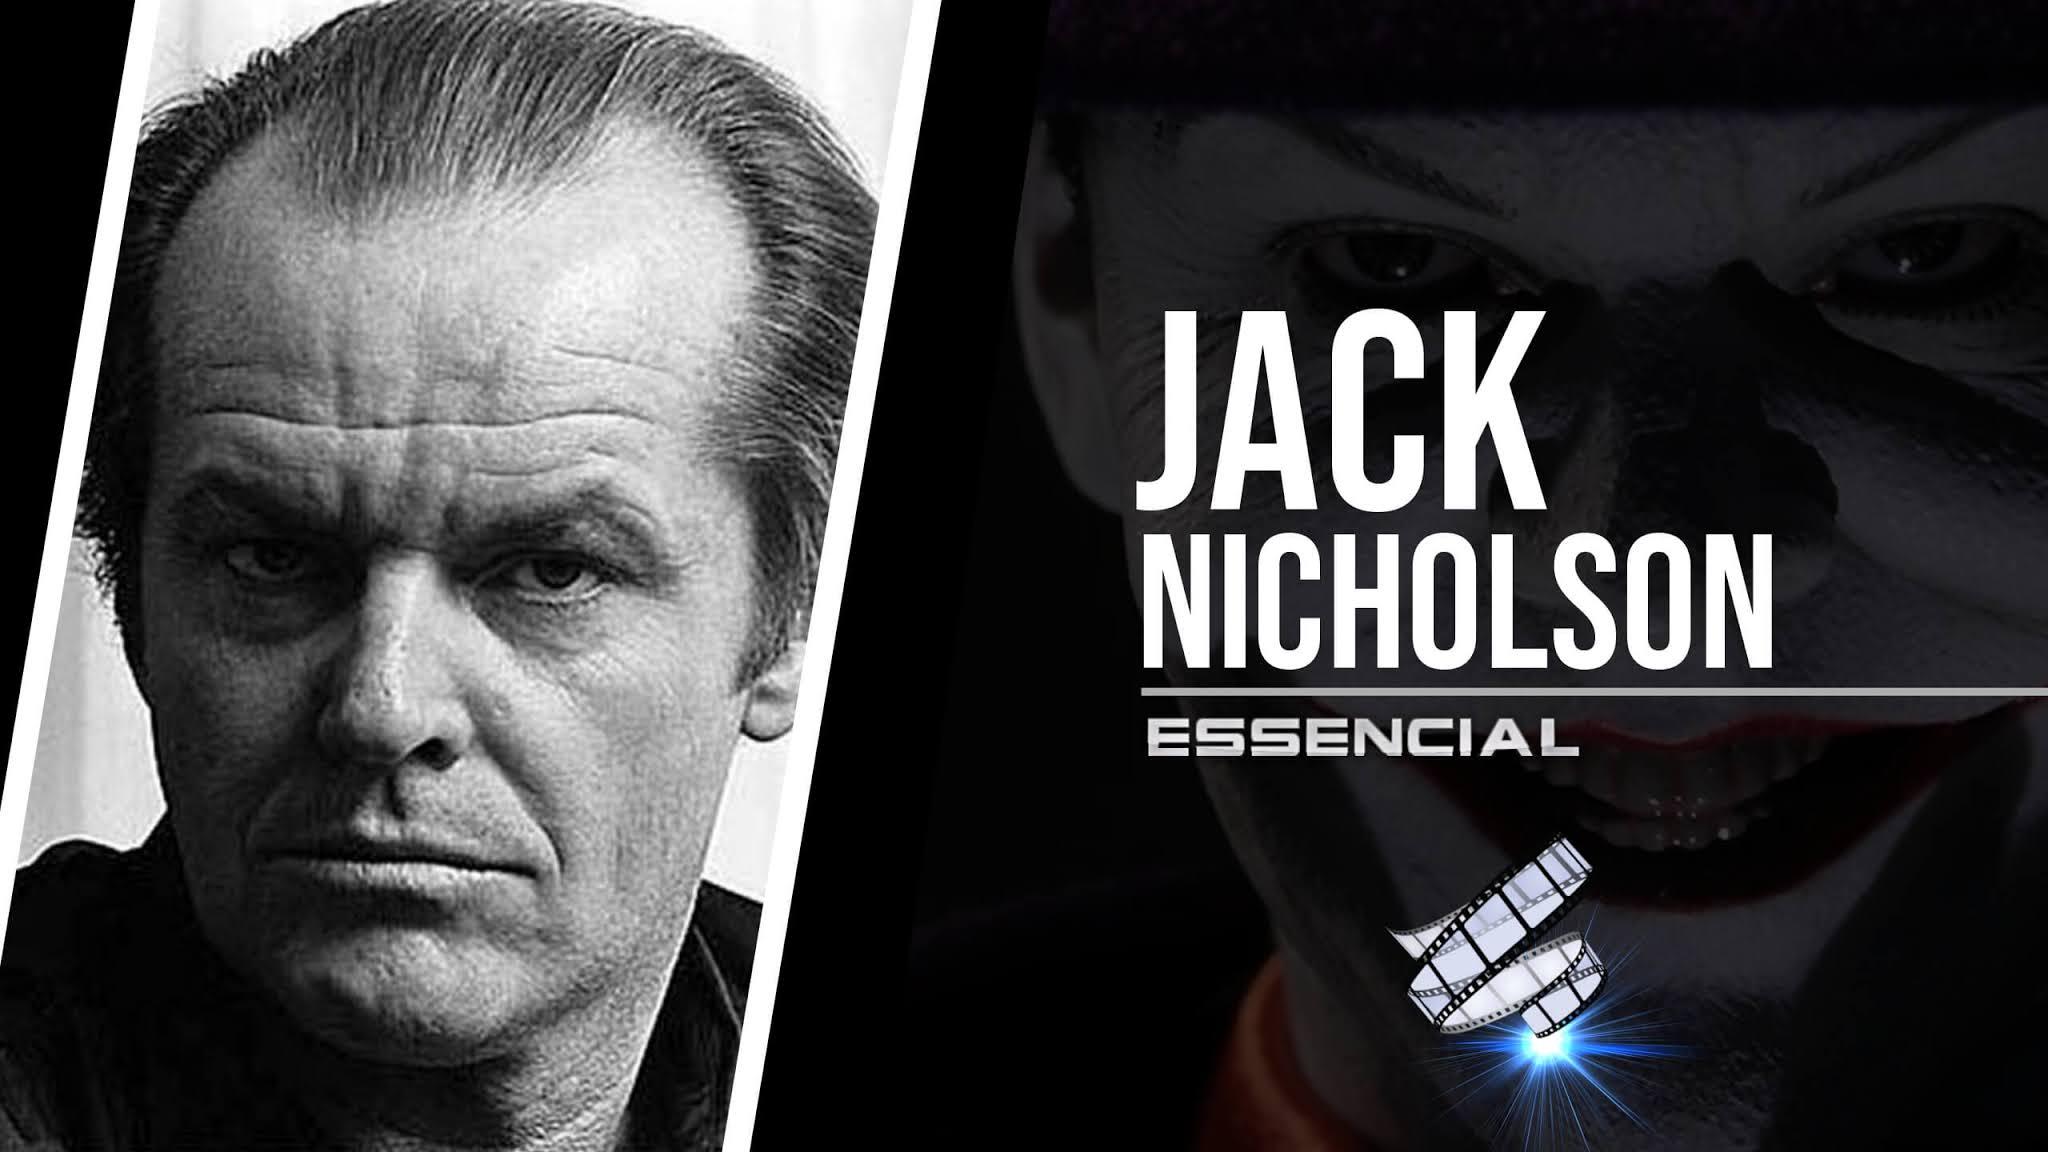 jack-nicholson-10-filmes-essenciais